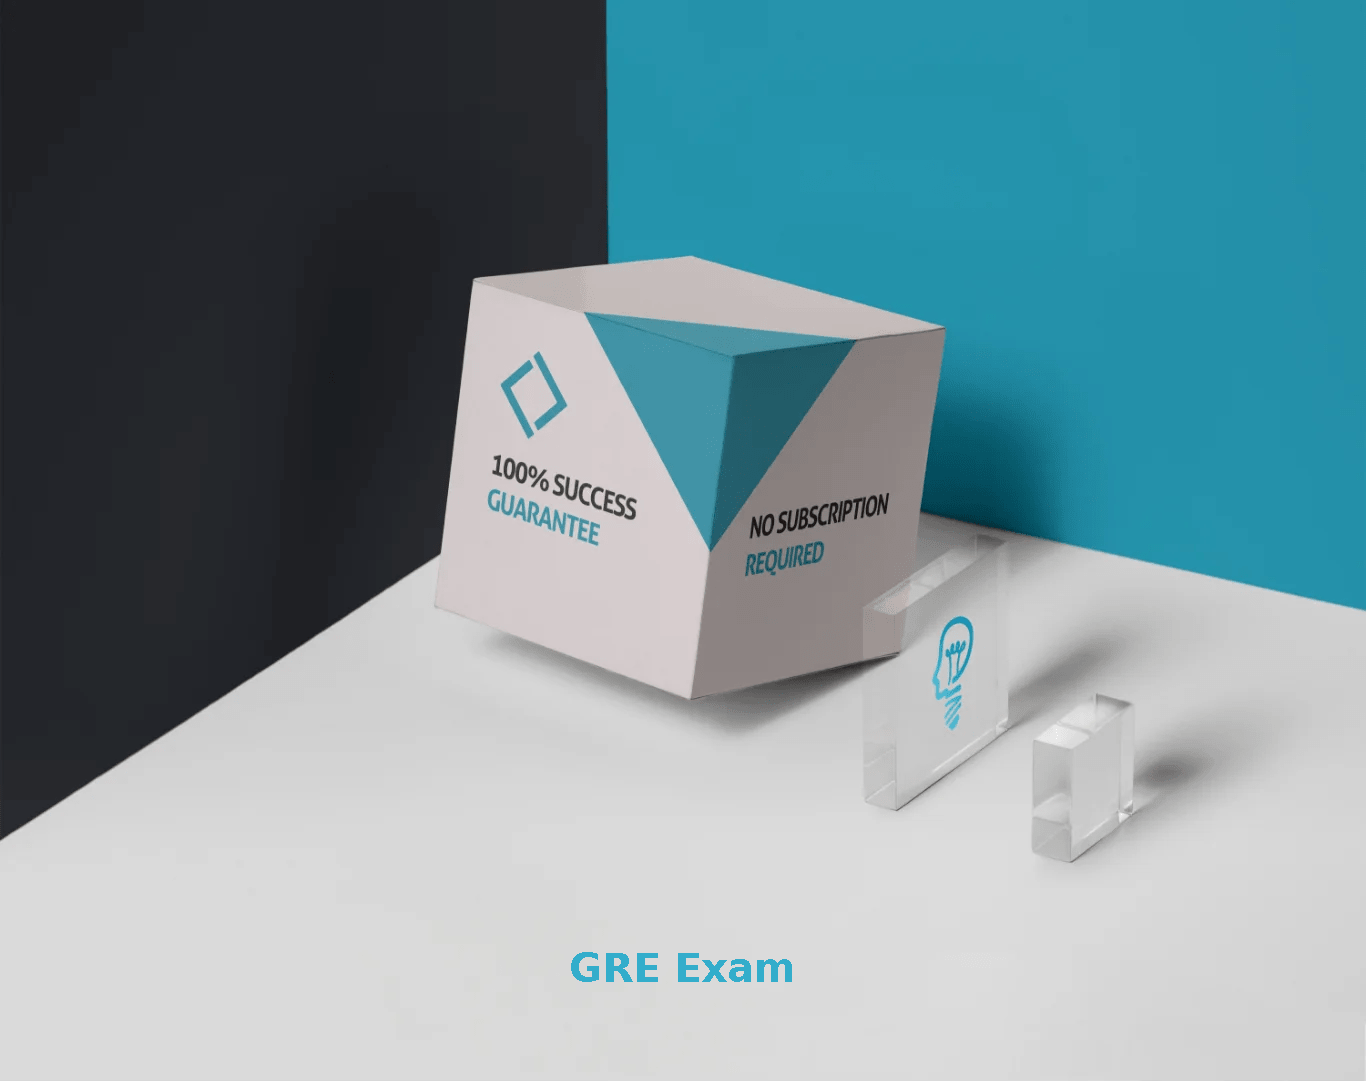 GRE Exam Dumps